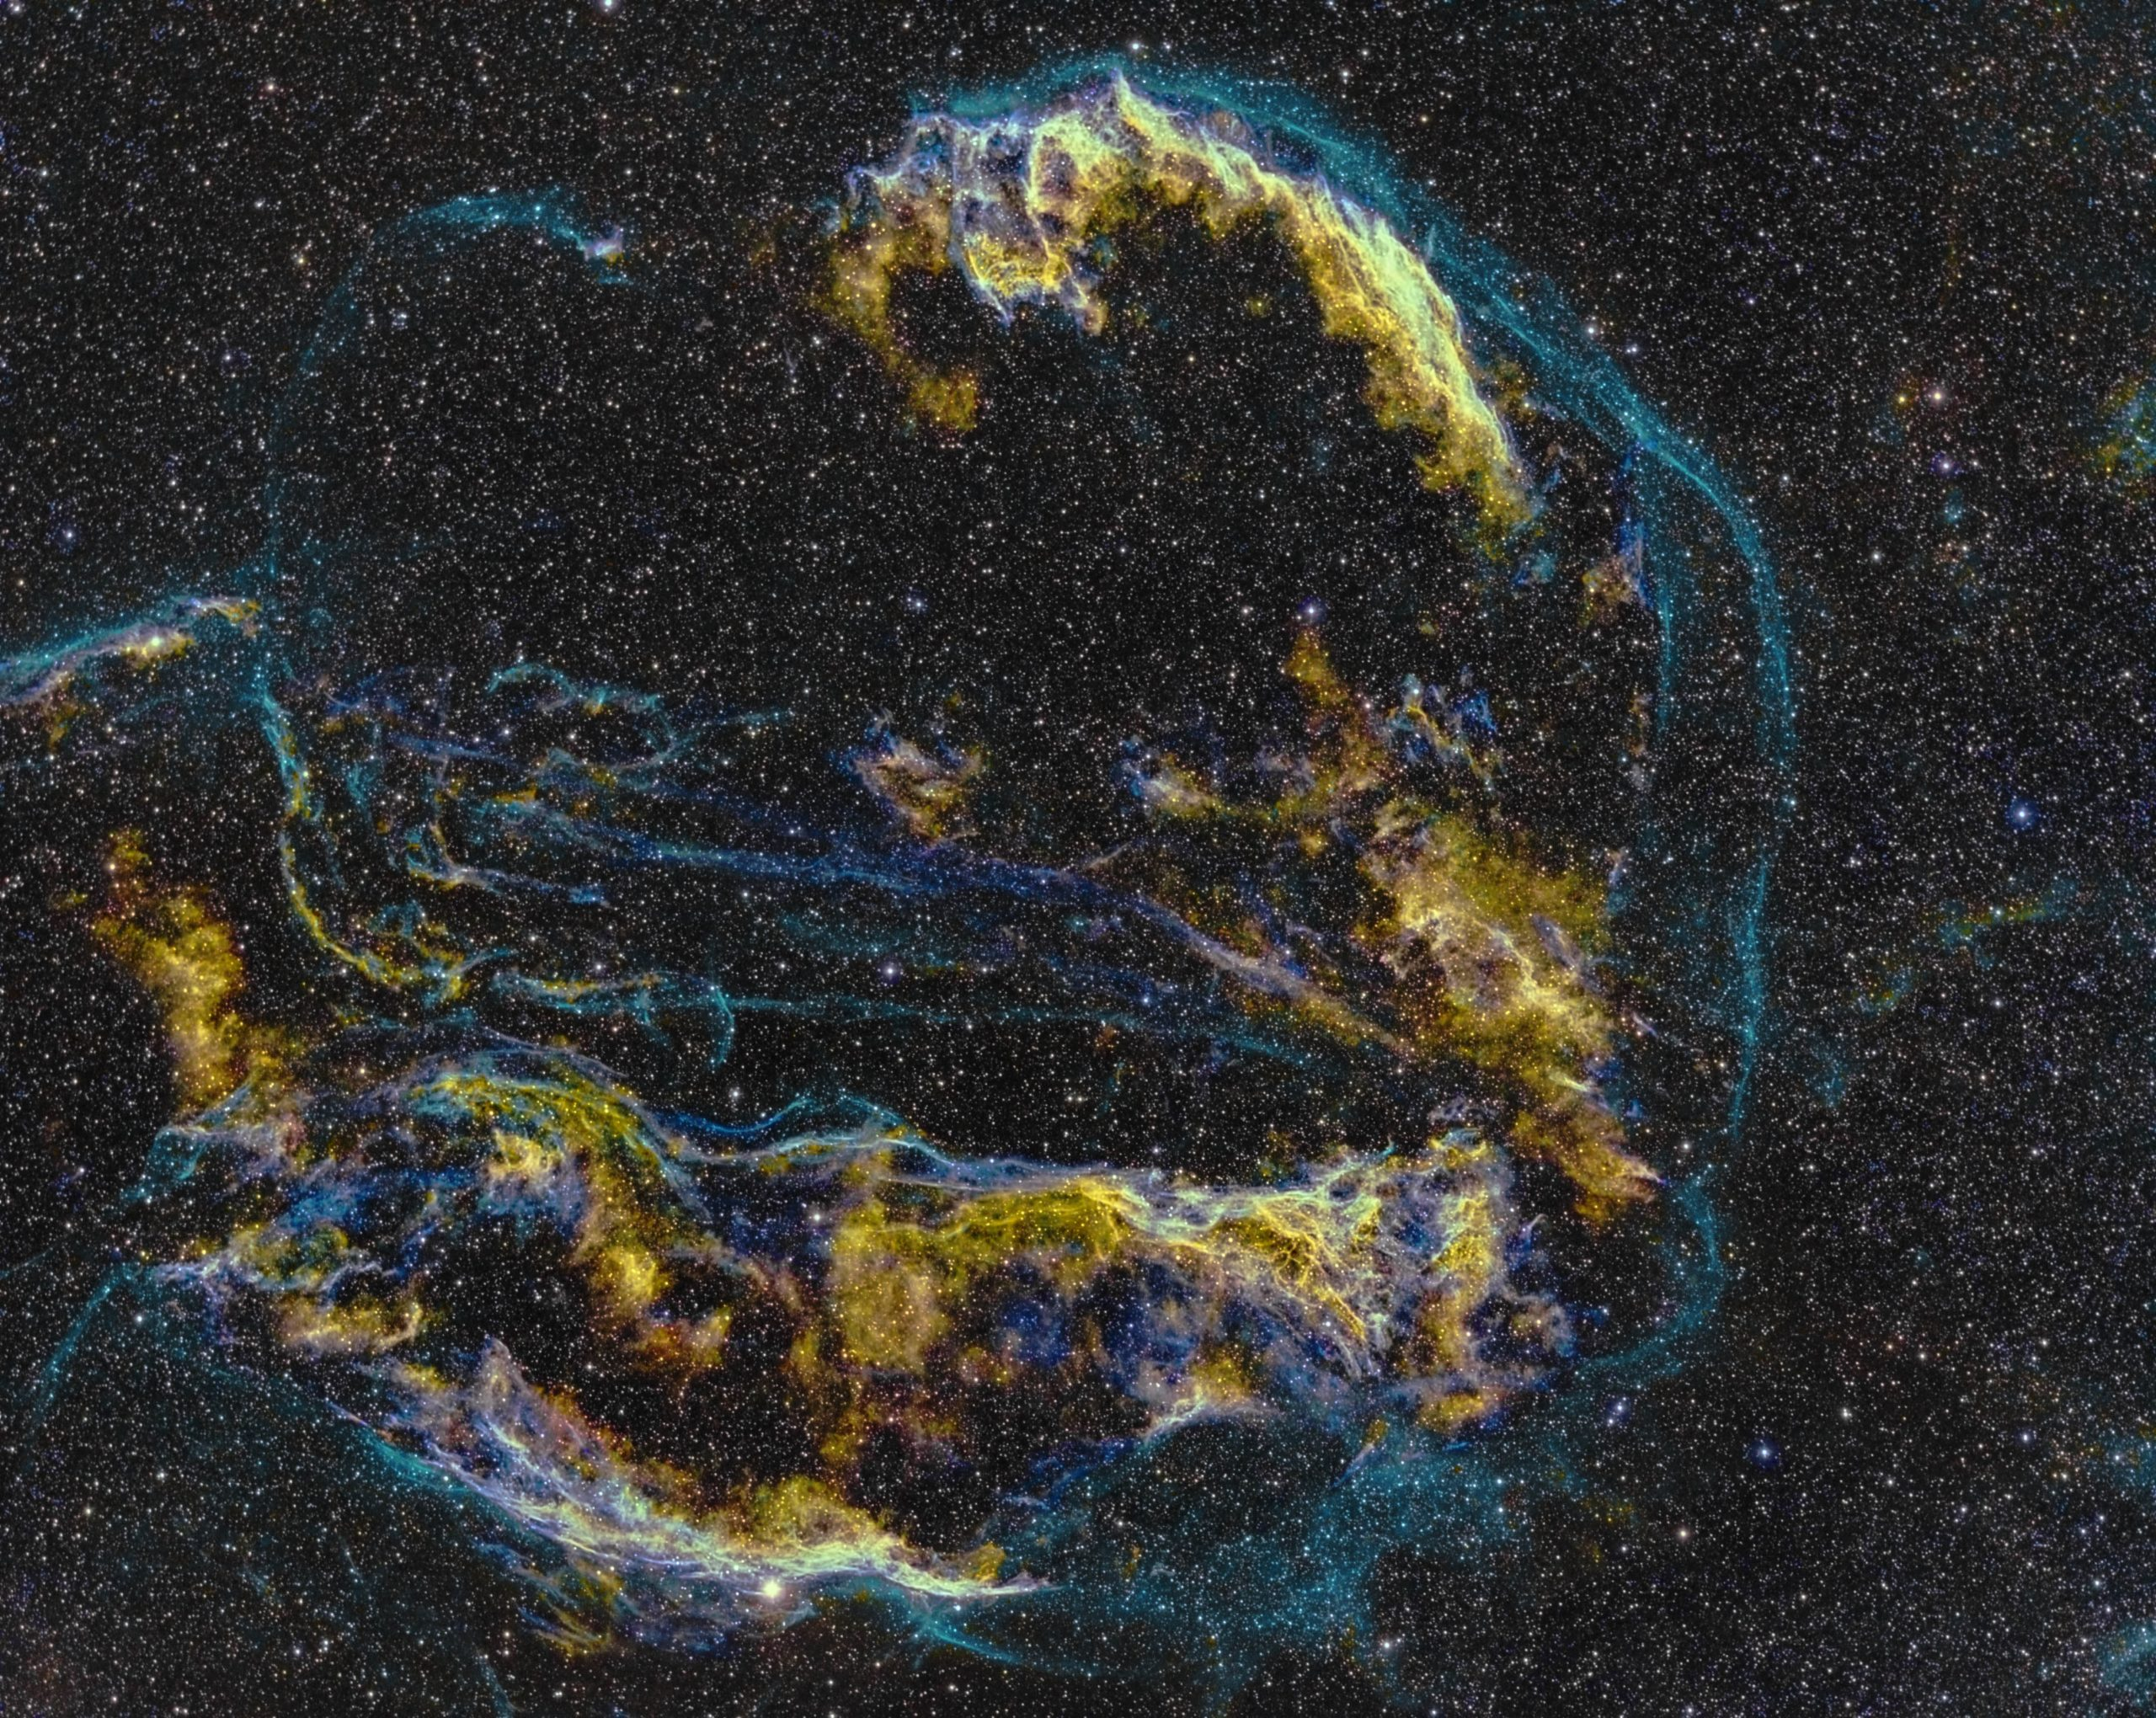 Sterneentfernen in Pixinsight II – die Zauner Methode